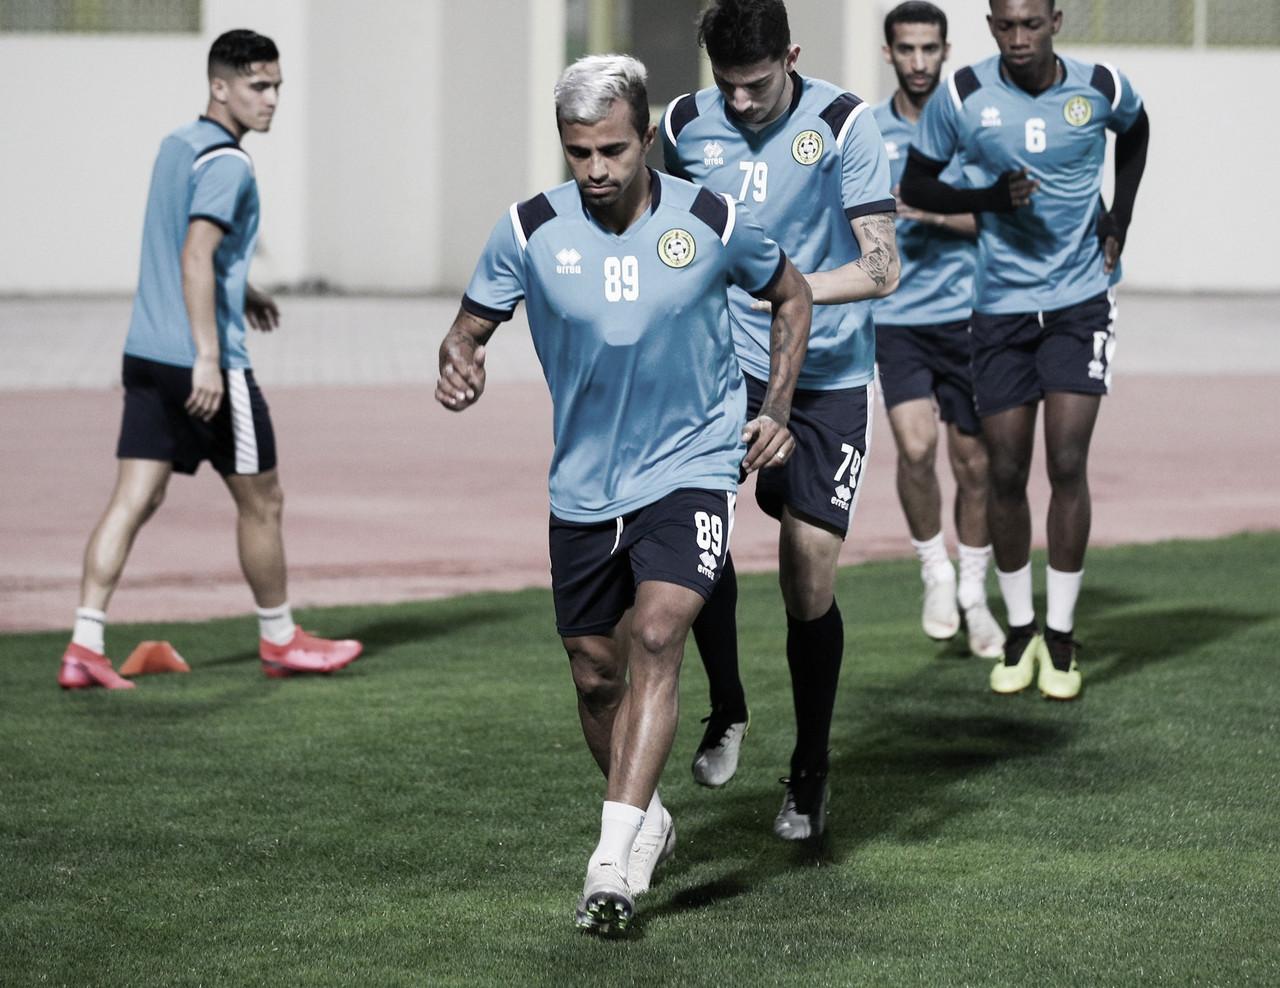 Wanderson fala sobre desenvolvimento no futebol árabe pelo Ittihad Kalba